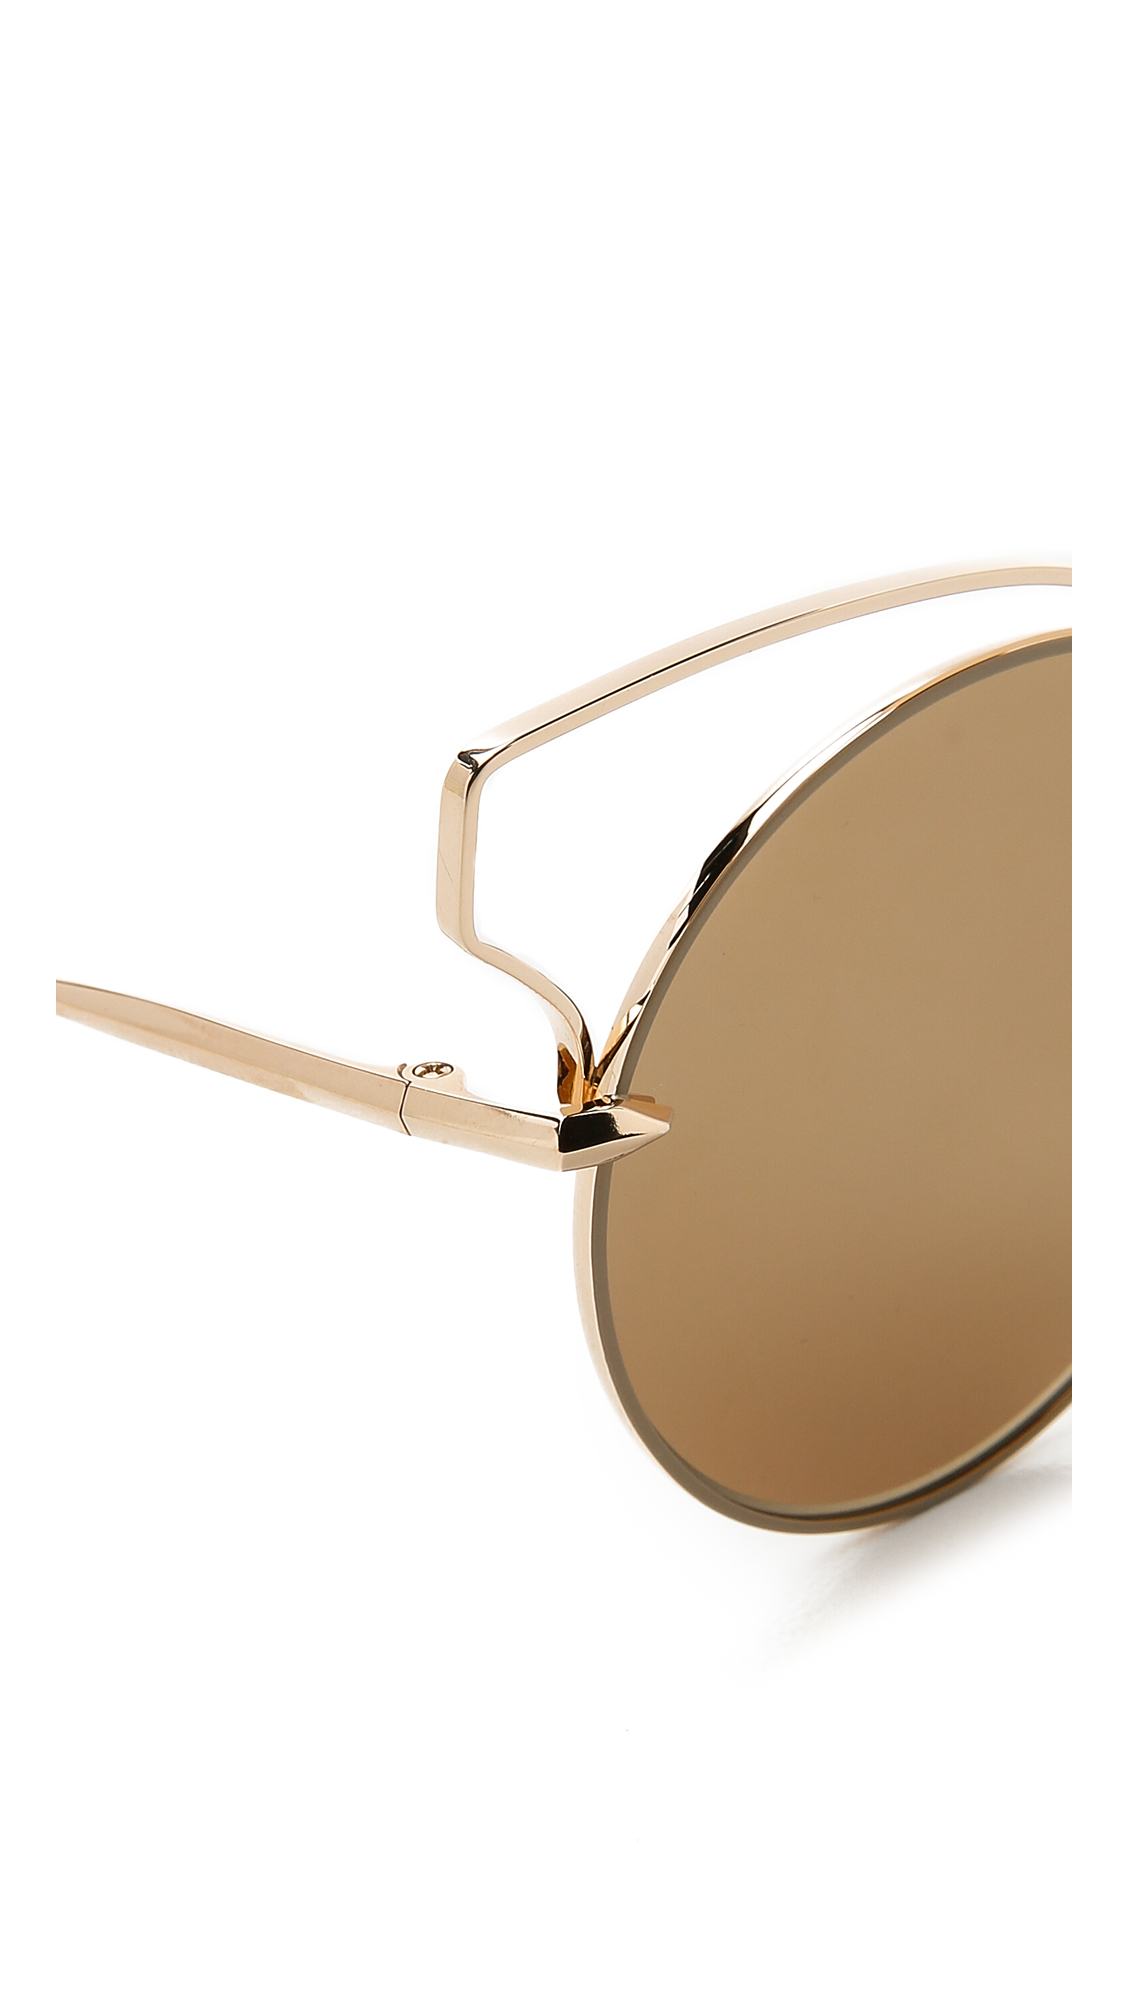 5eeefa2353f3 DITA Believer Sunglasses - Tan Gold/gold Flash in Brown - Lyst